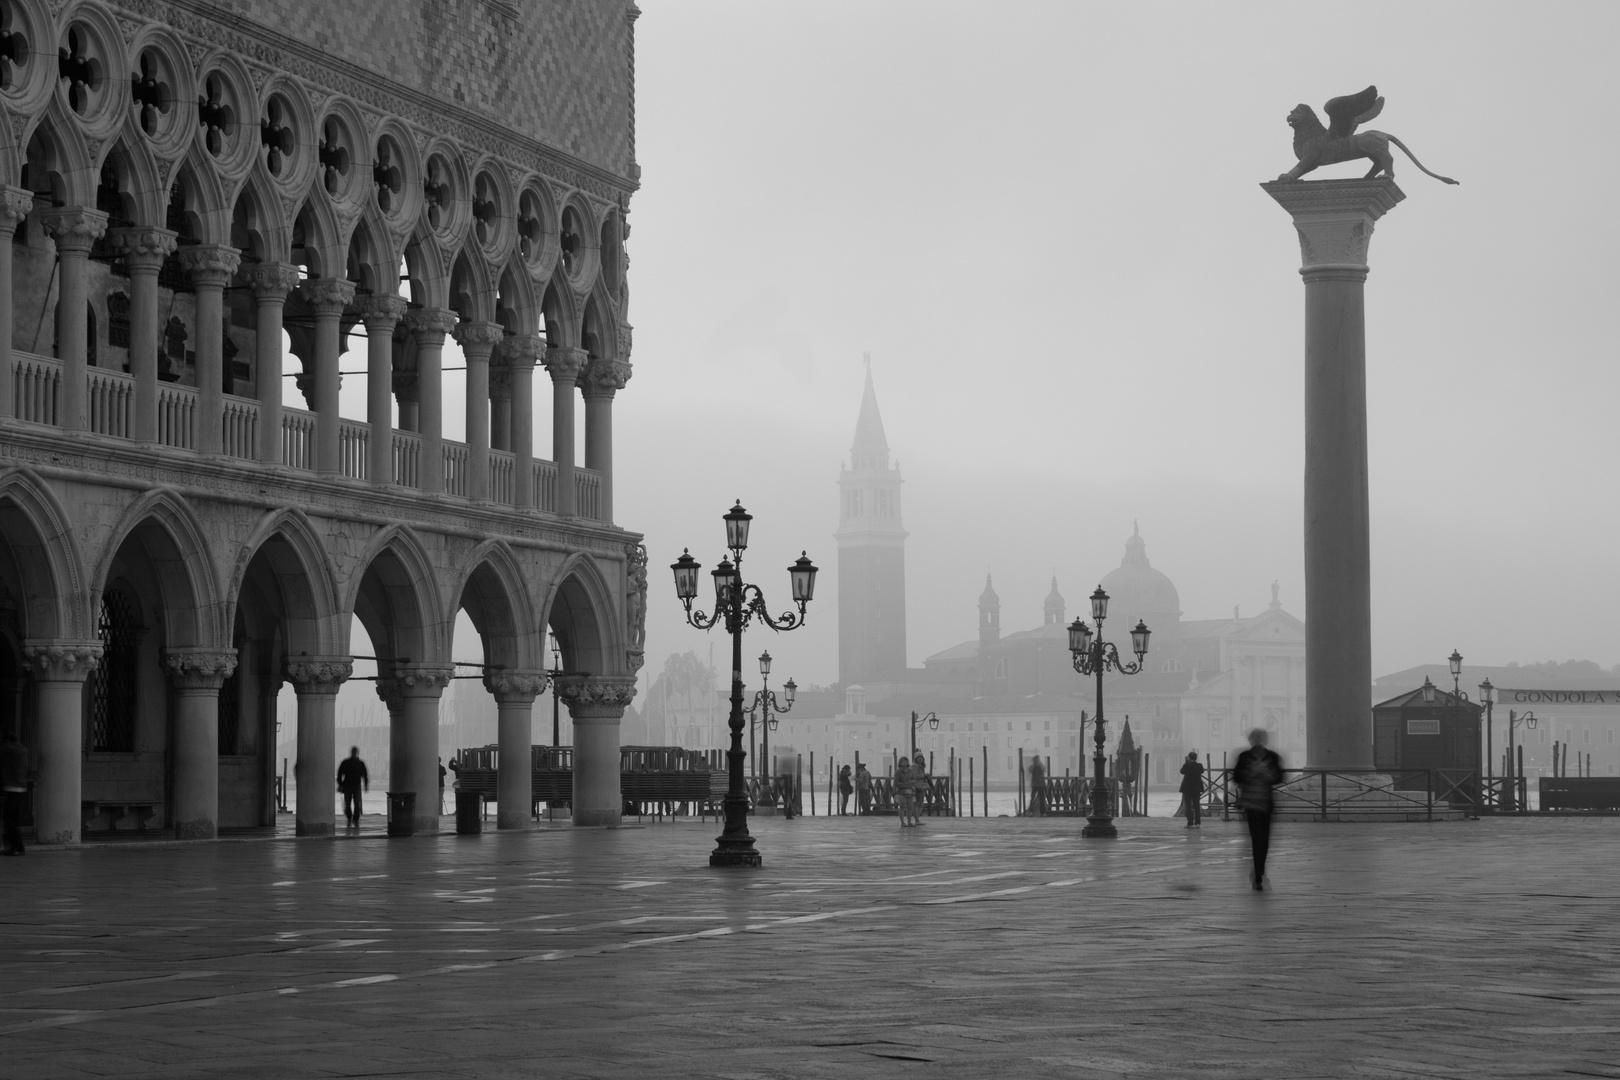 Frühmorgens auf dem Markusplatz in Venedig